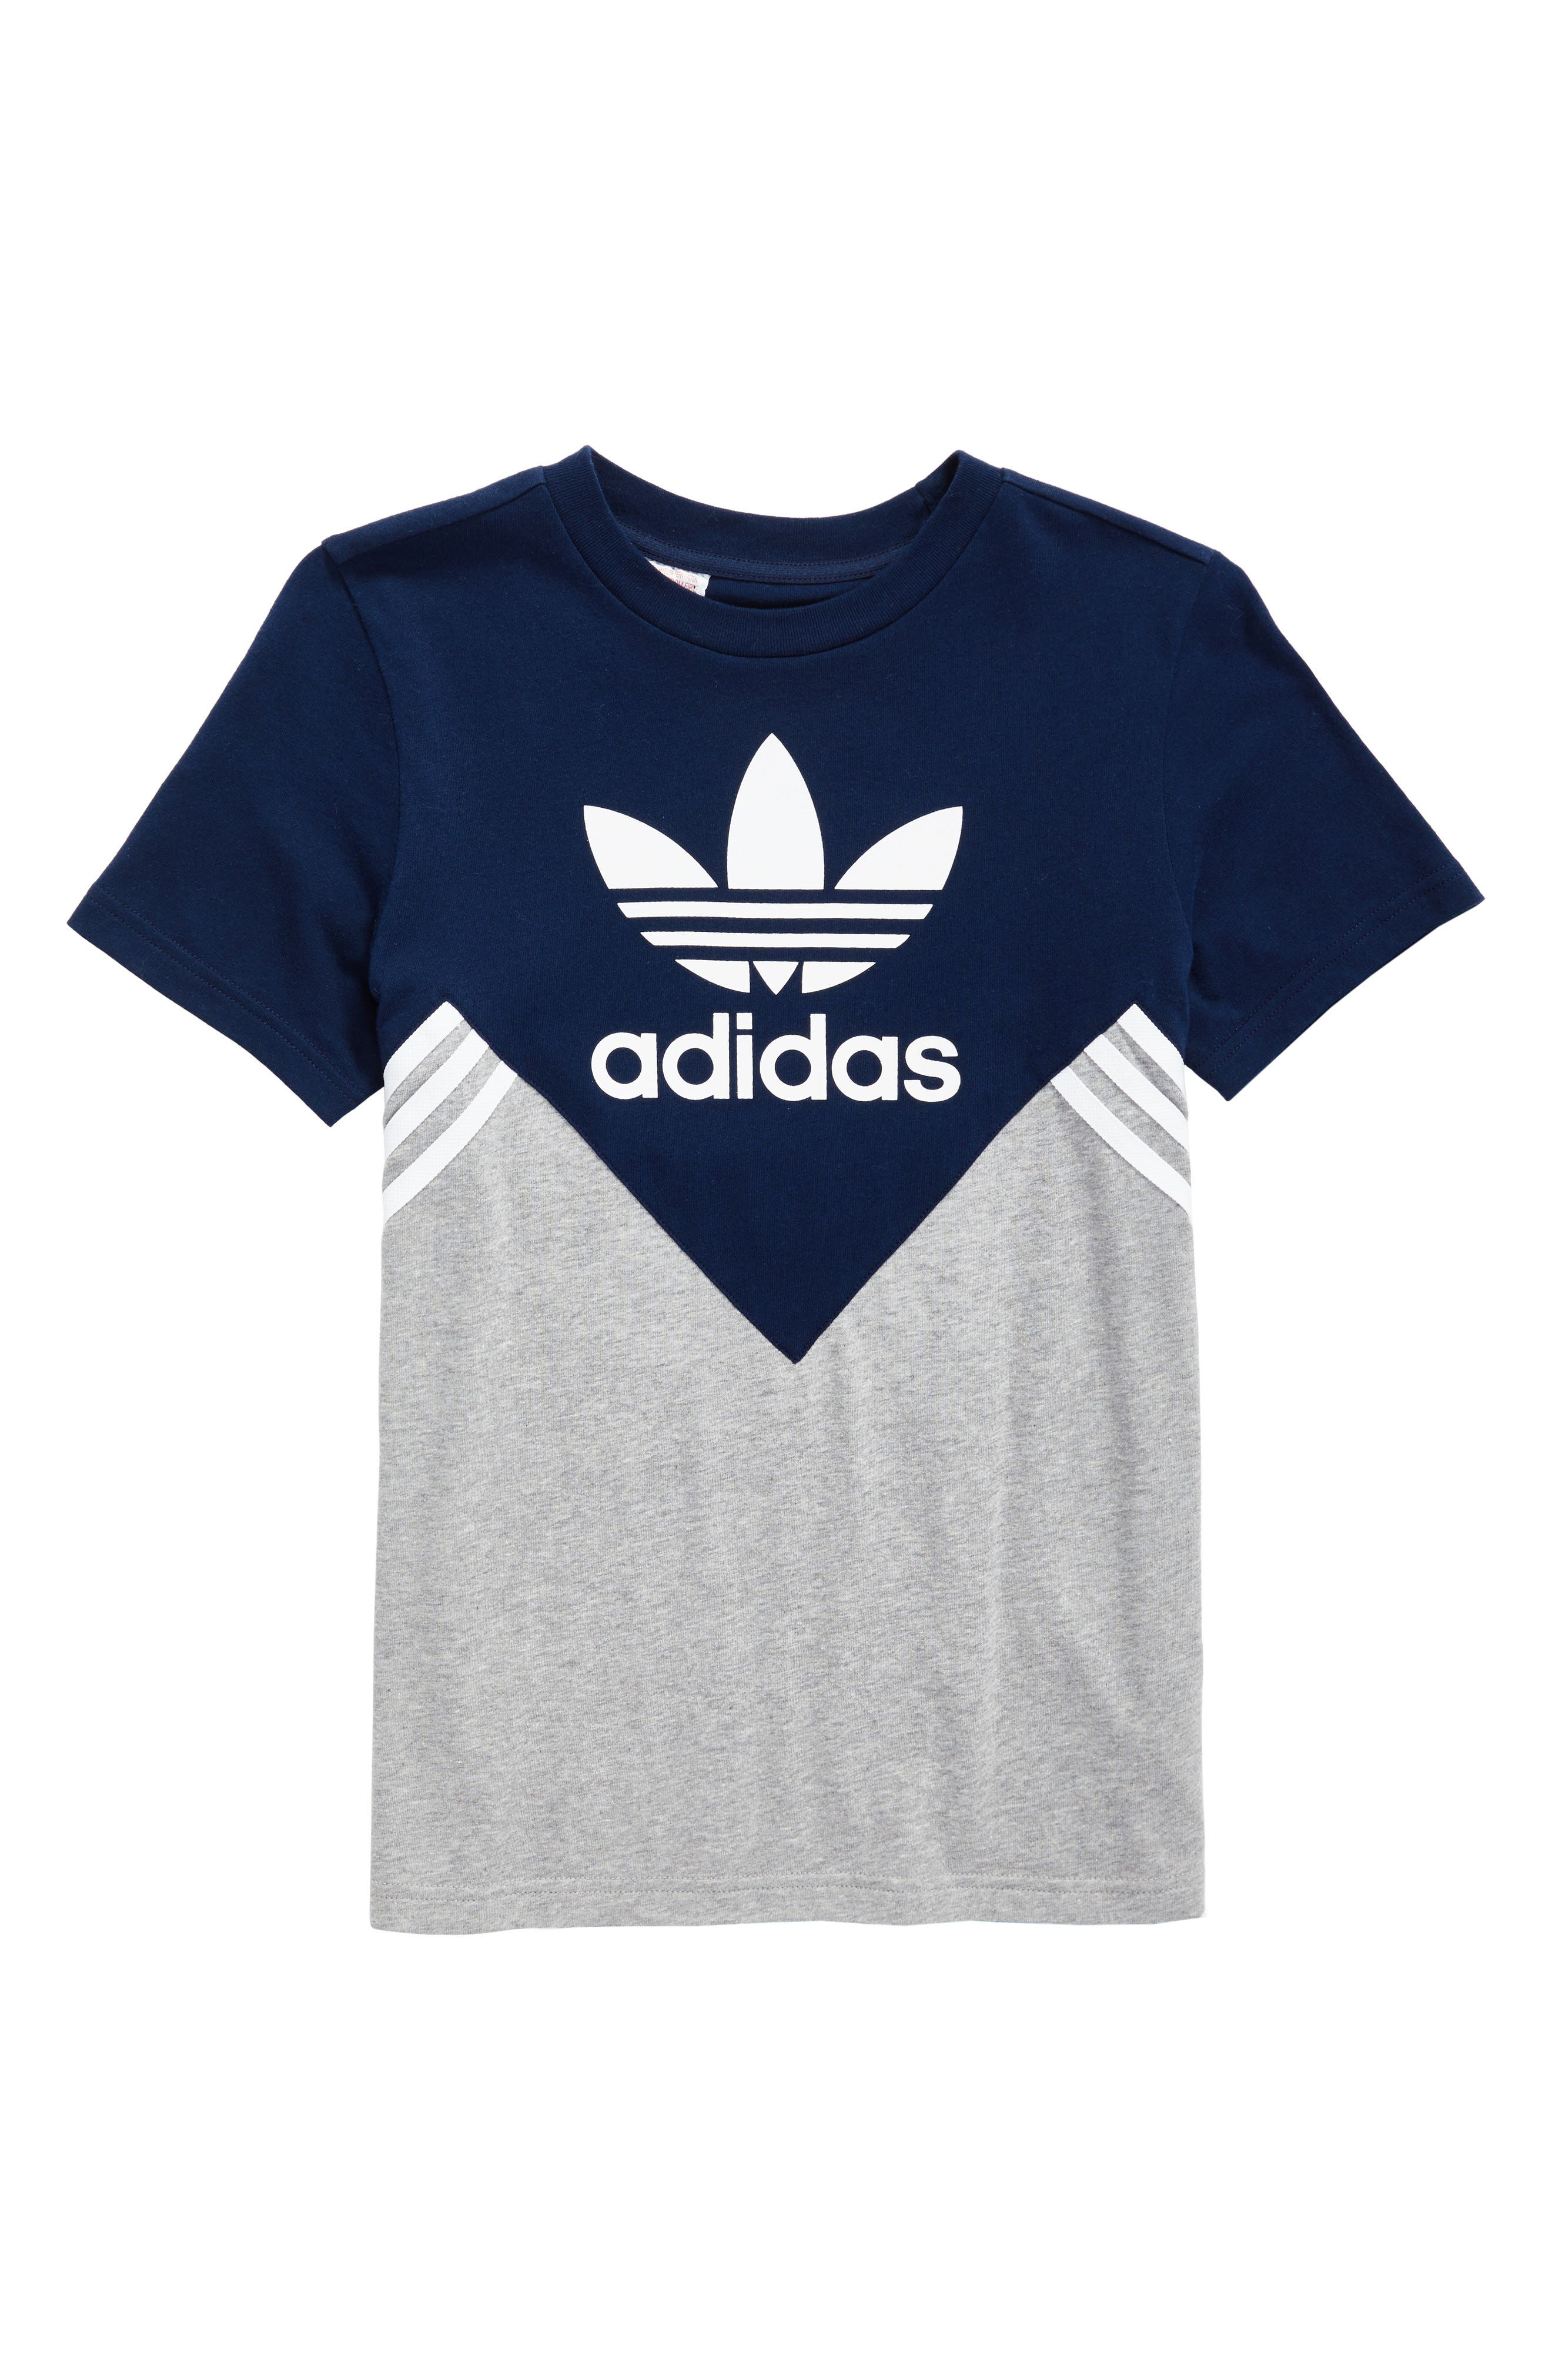 adidas FL Logo Graphic T-Shirt,                         Main,                         color, 415